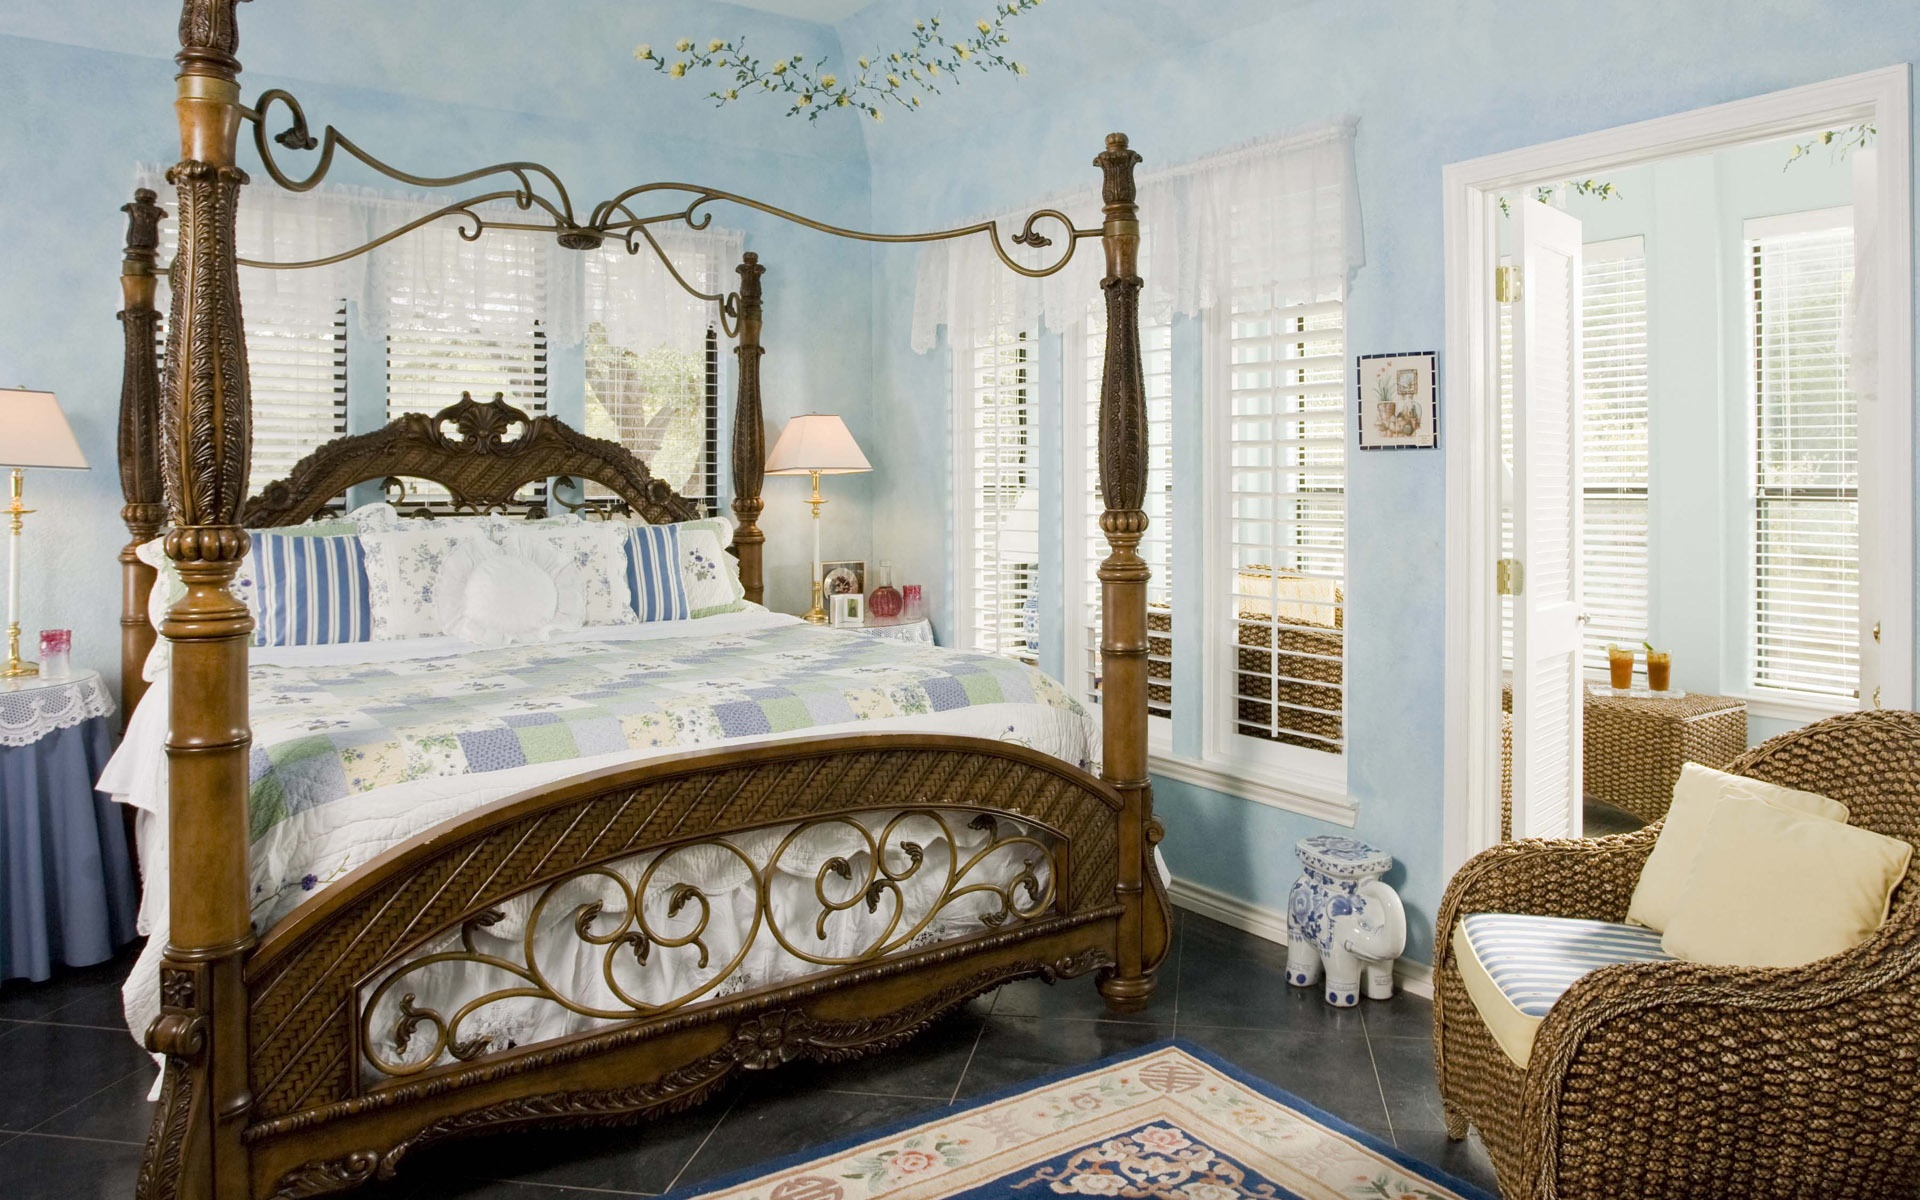 Schlafzimmer, Bett, Stuhl, Fenster 1920x1200 HD